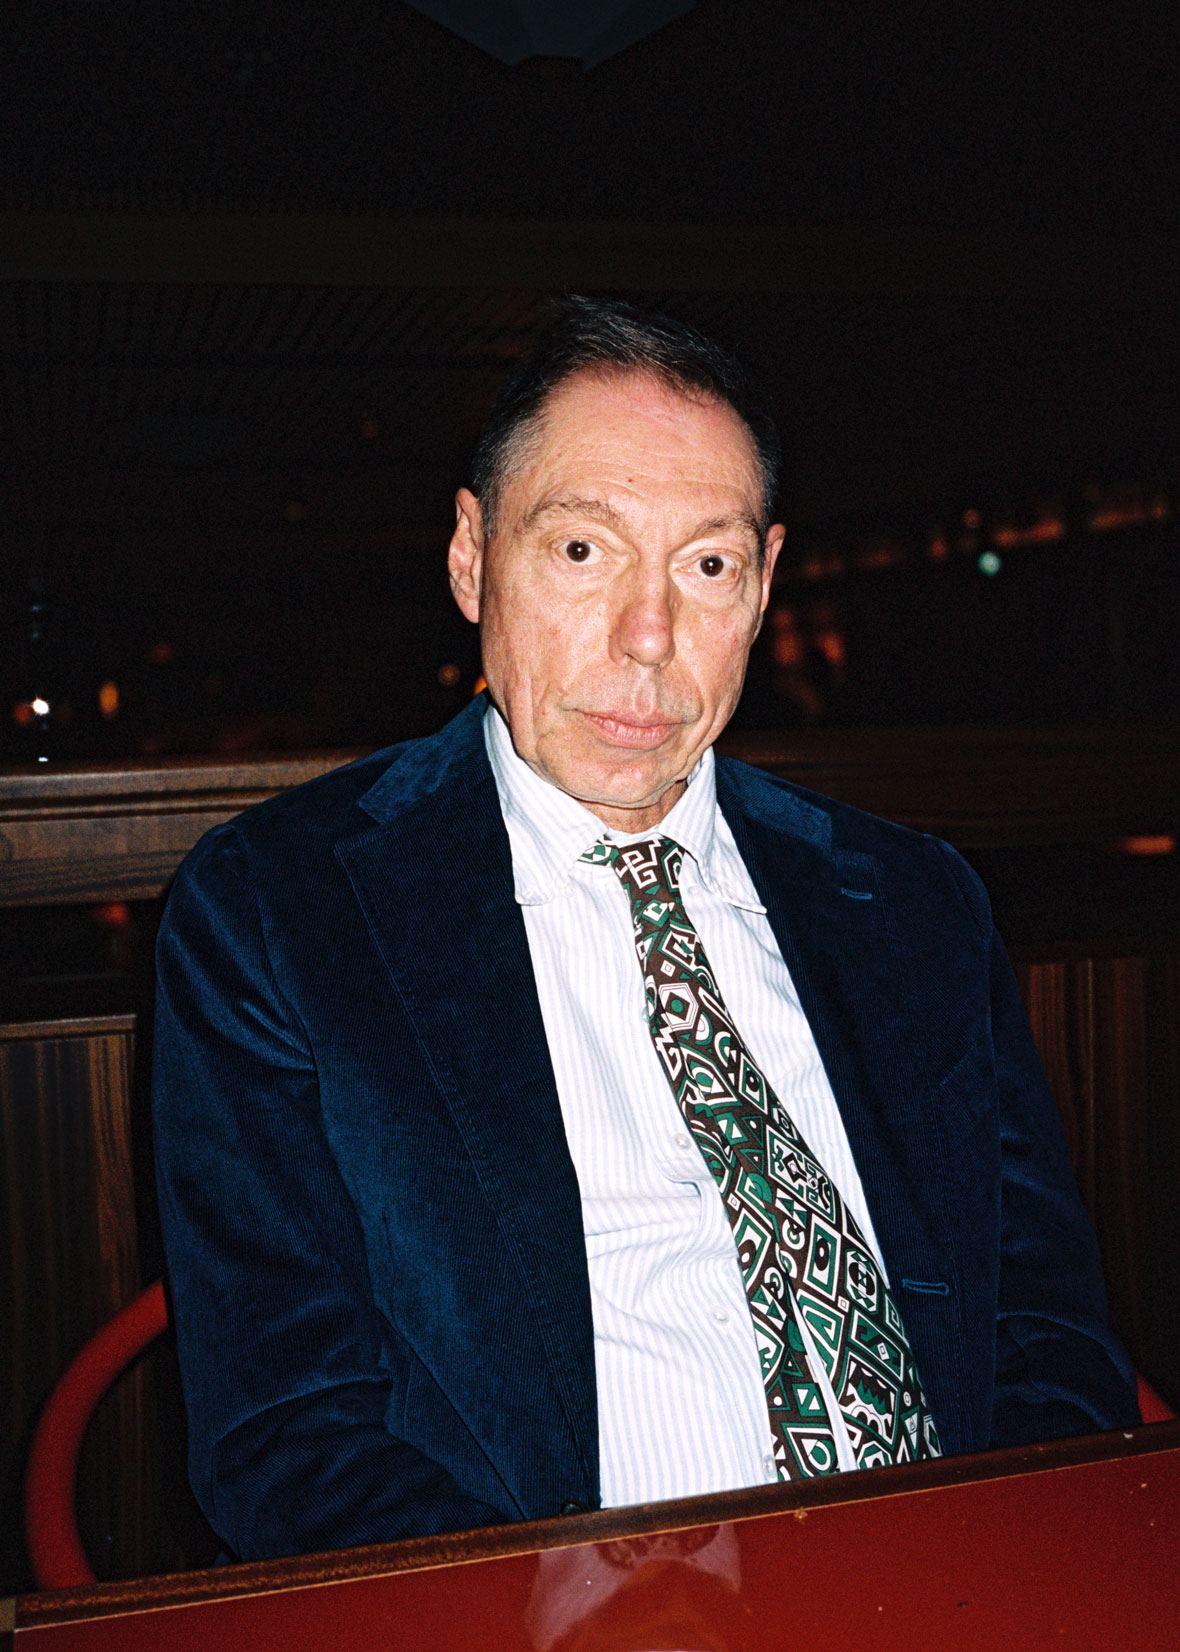 The Bureau: Musician and Composer, Peter Zummo